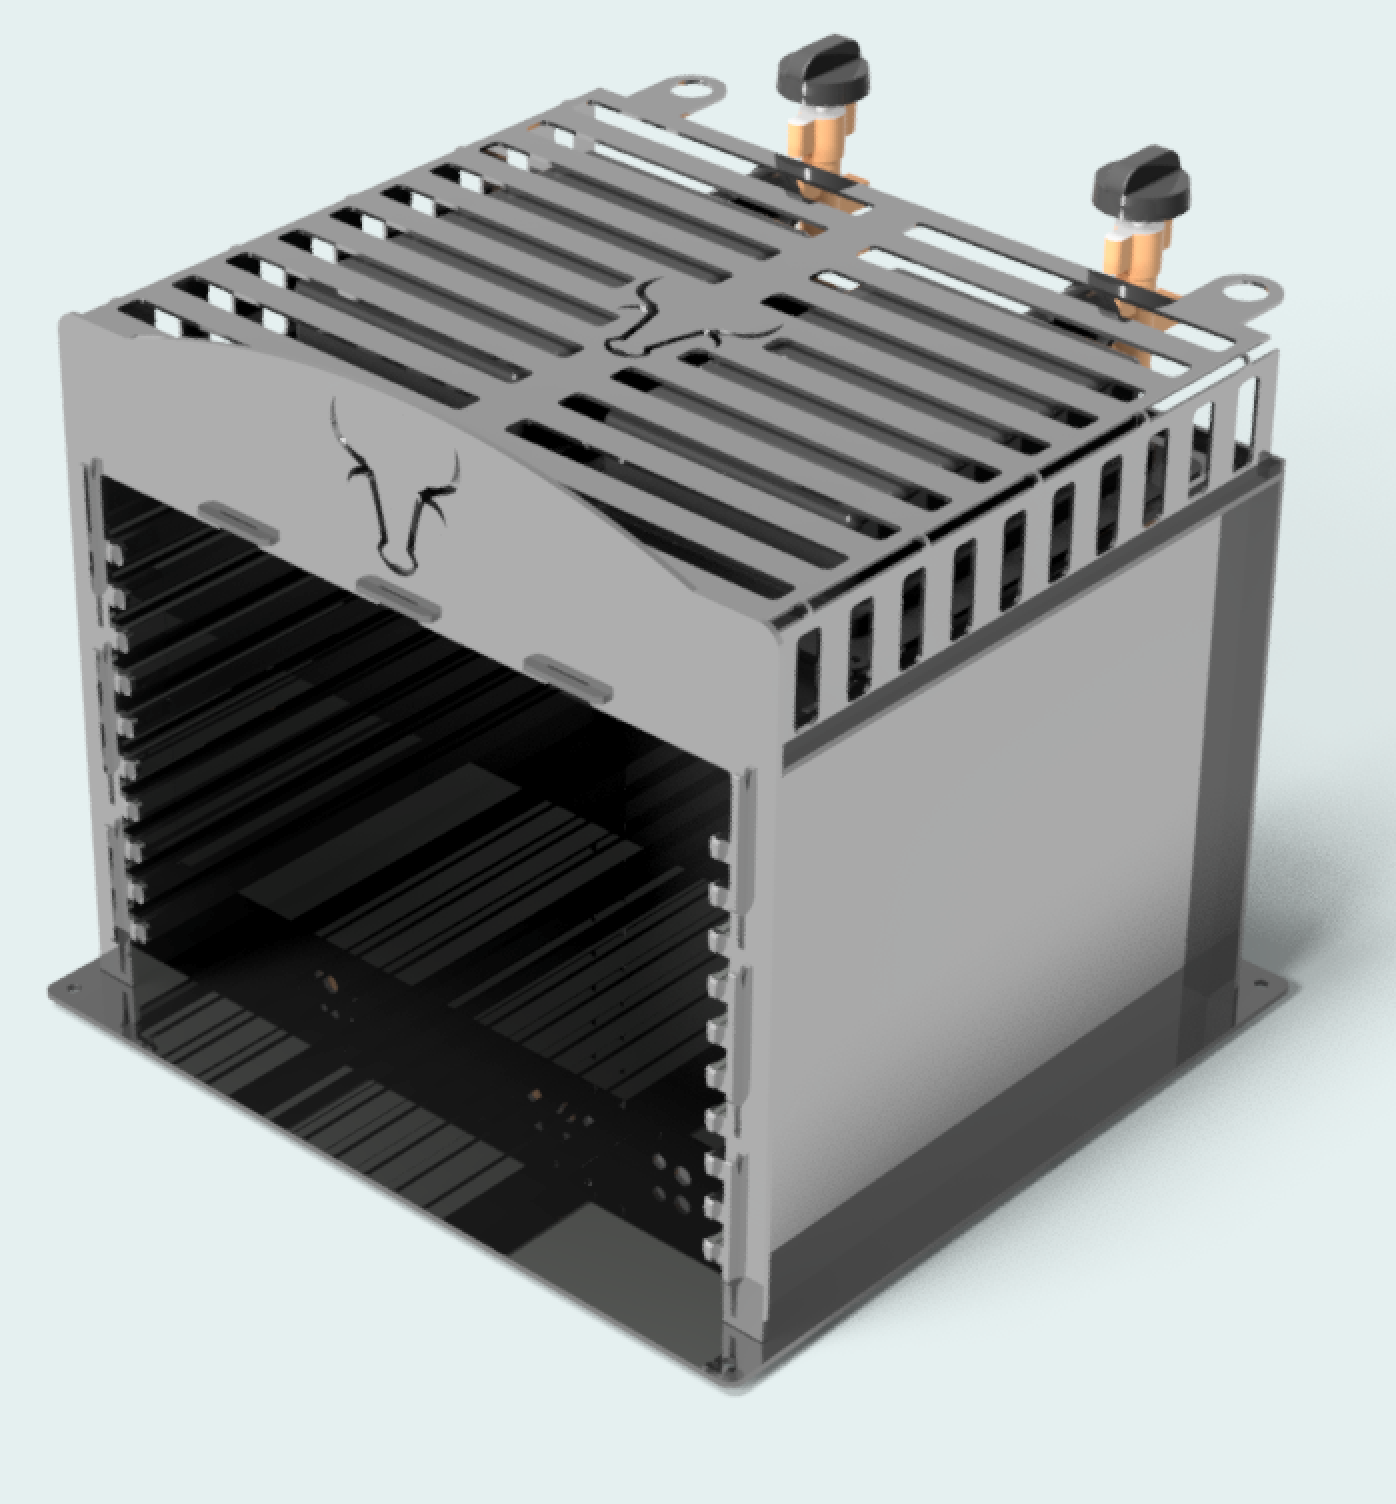 anleitung eigenbau oberhitze grill seite 66 grillforum. Black Bedroom Furniture Sets. Home Design Ideas